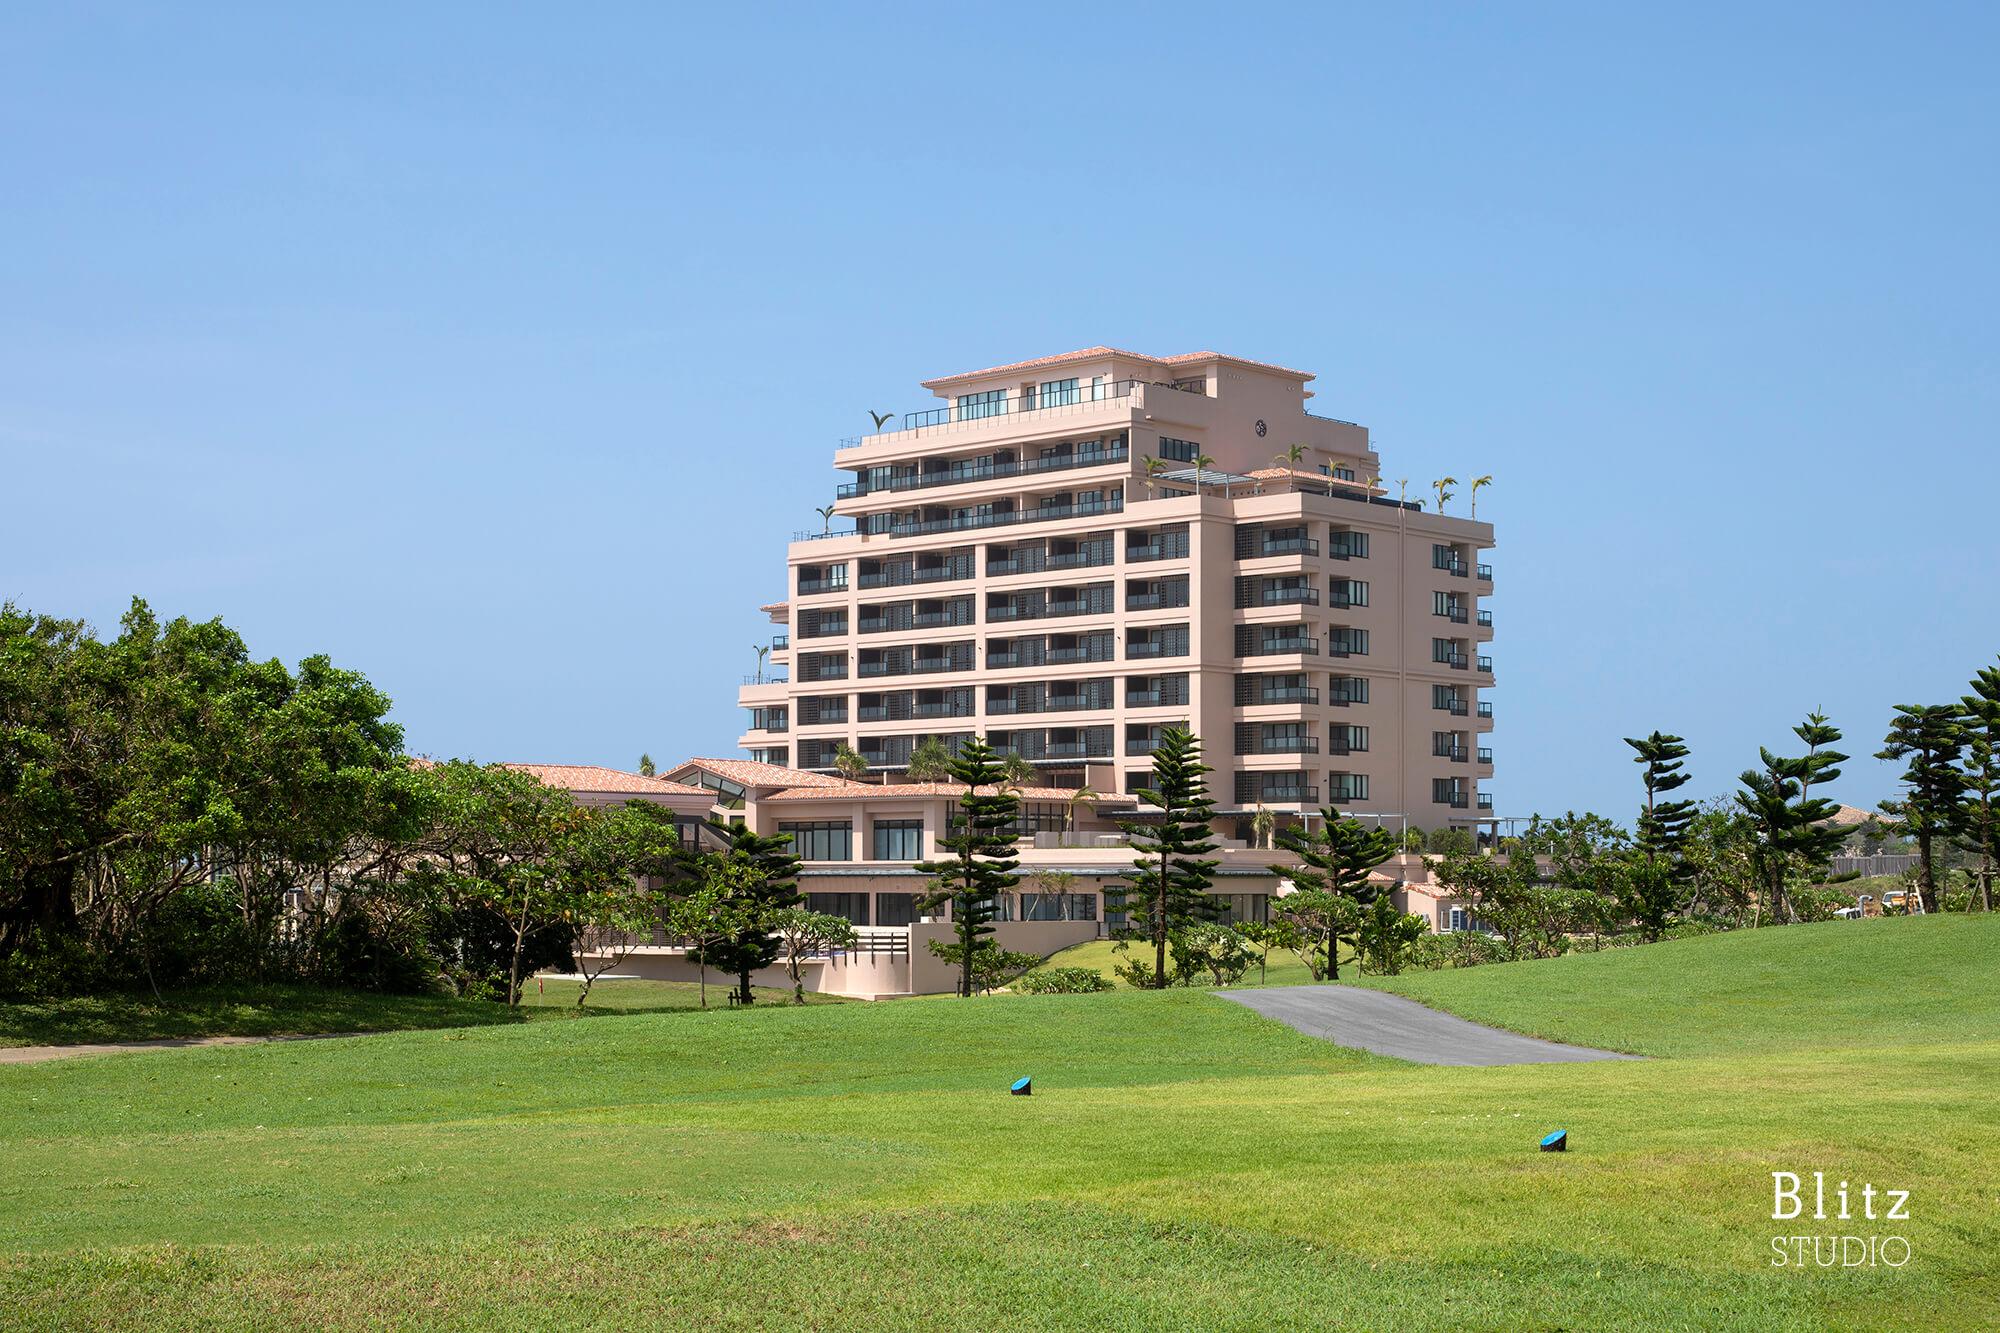 『HOTEL SHIGIRA MIRAGE BAYSIDE』-沖縄県宮古島市-建築写真・竣工写真・インテリア写真5